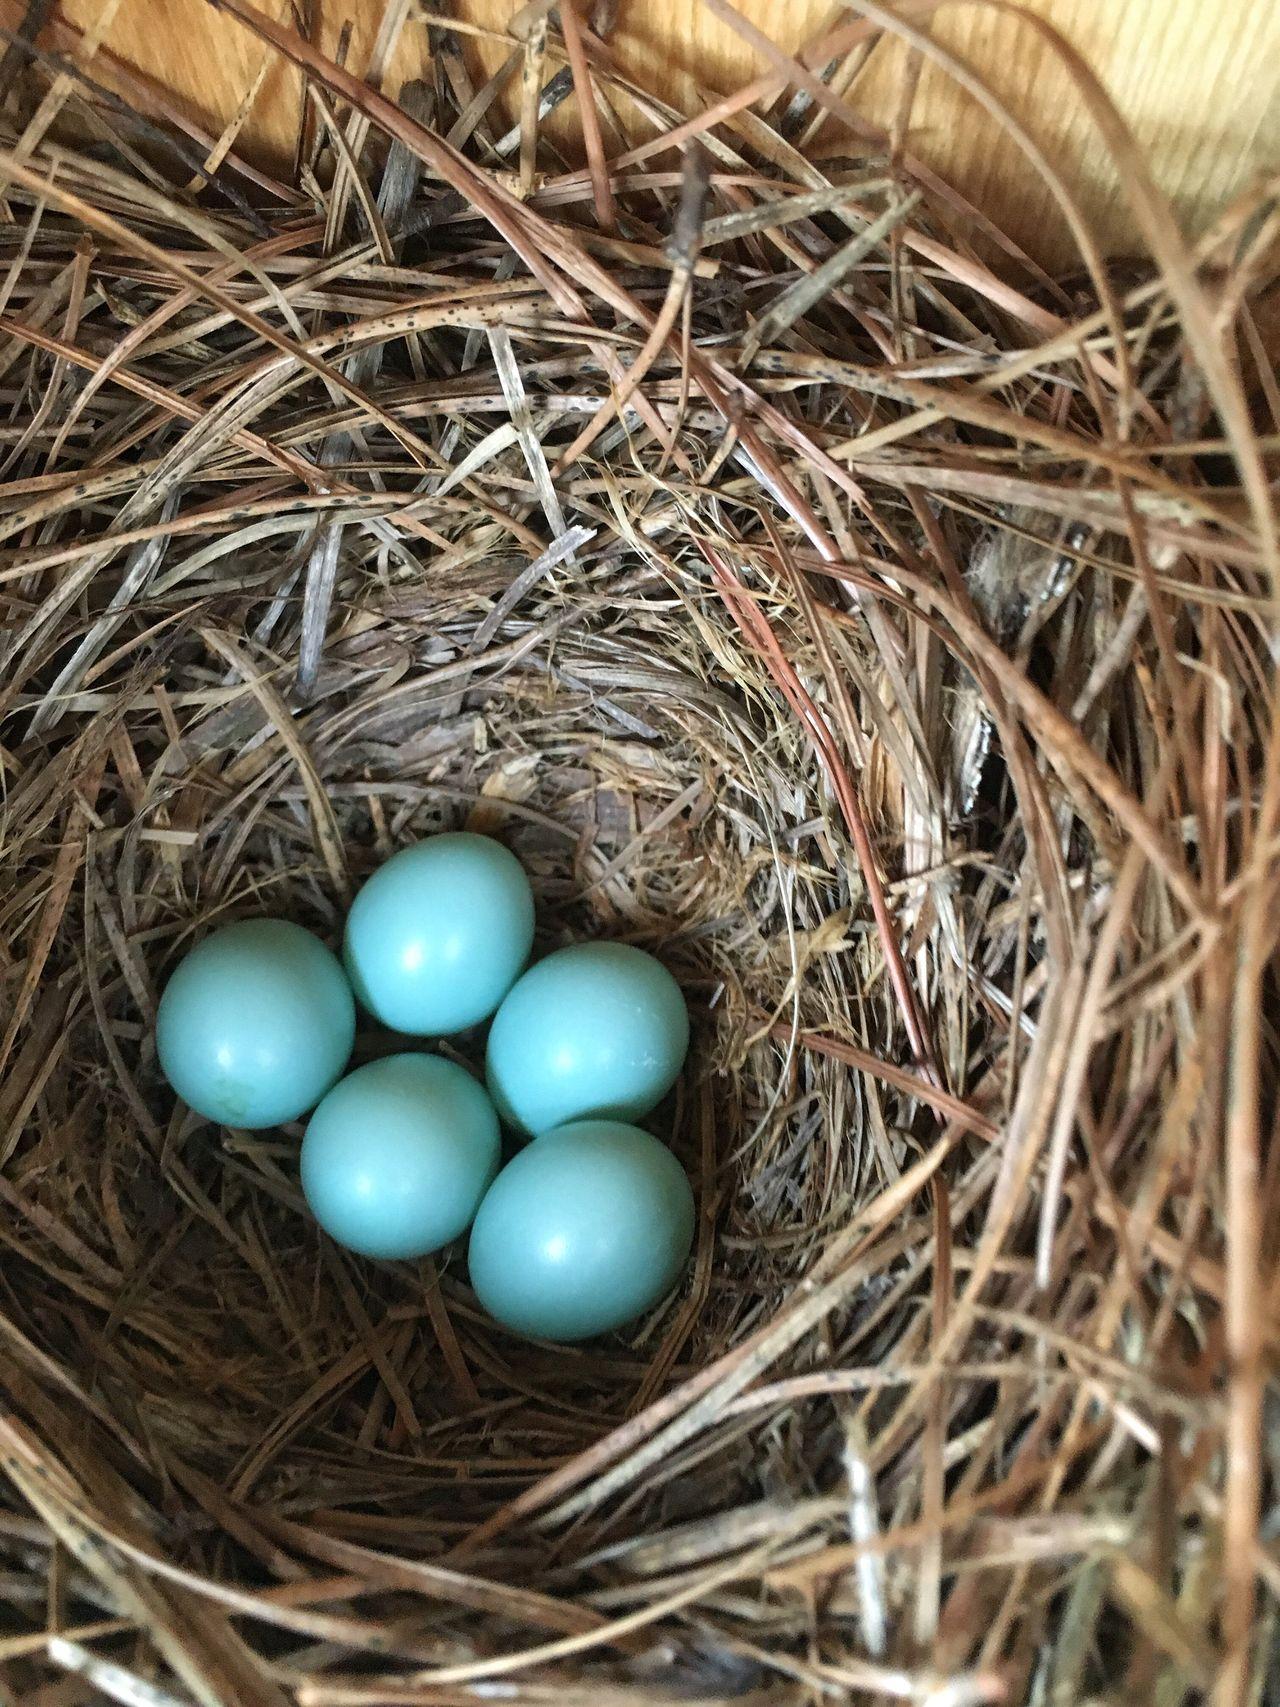 First Bluebird clutch of the season in one of our bird houses. Nests Bluebird Eggs Bird Nest